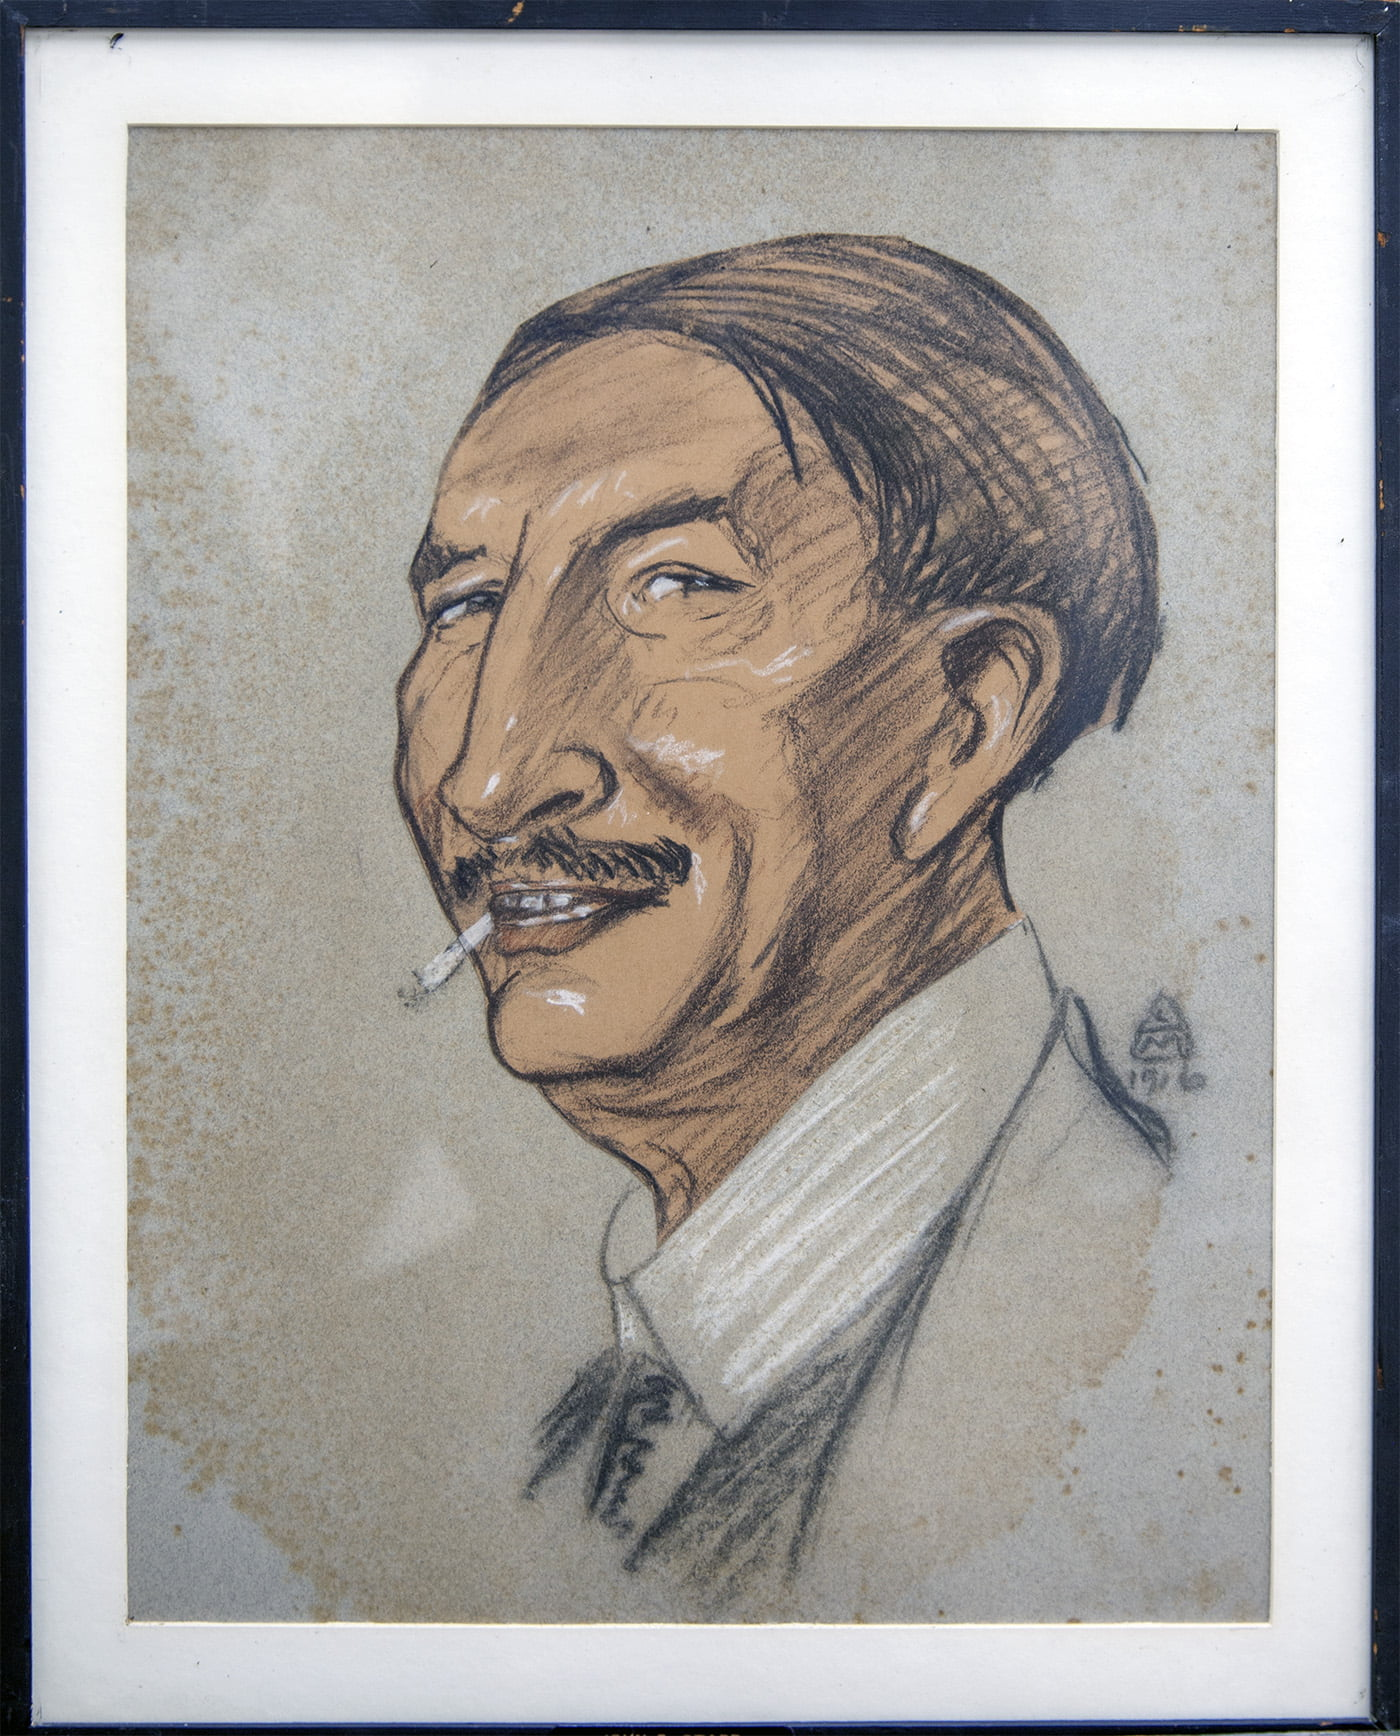 Leo Mielziner (1869-1935) [RA 1912-1935] : Caricature of John Edwin Starr (1860-1931) [RL 1897-1931], 1916.